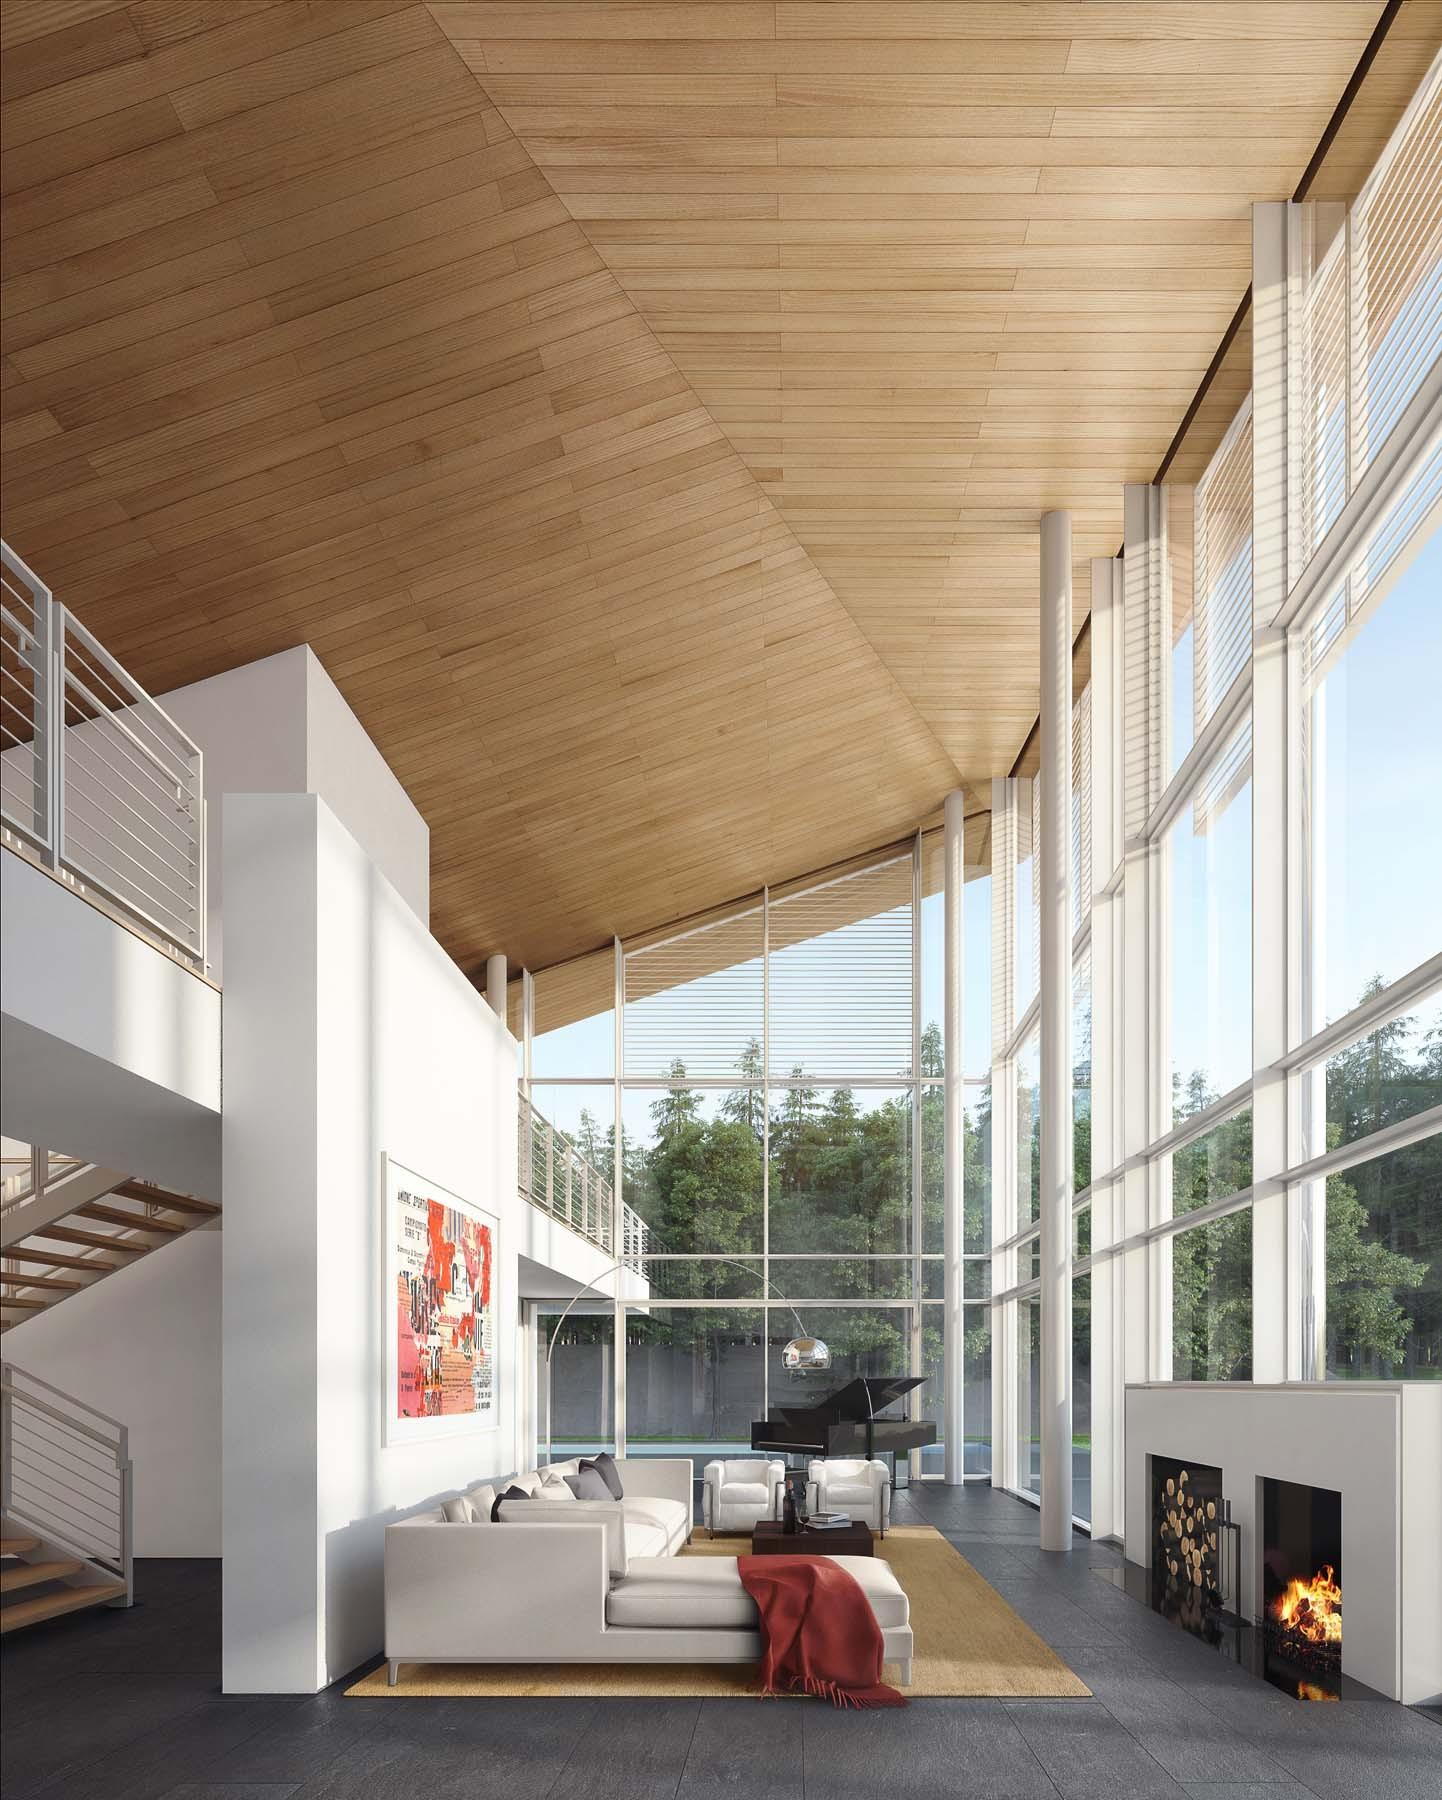 Richard Meier & Partners Designs Two Villas for Ground-Up Modern ...